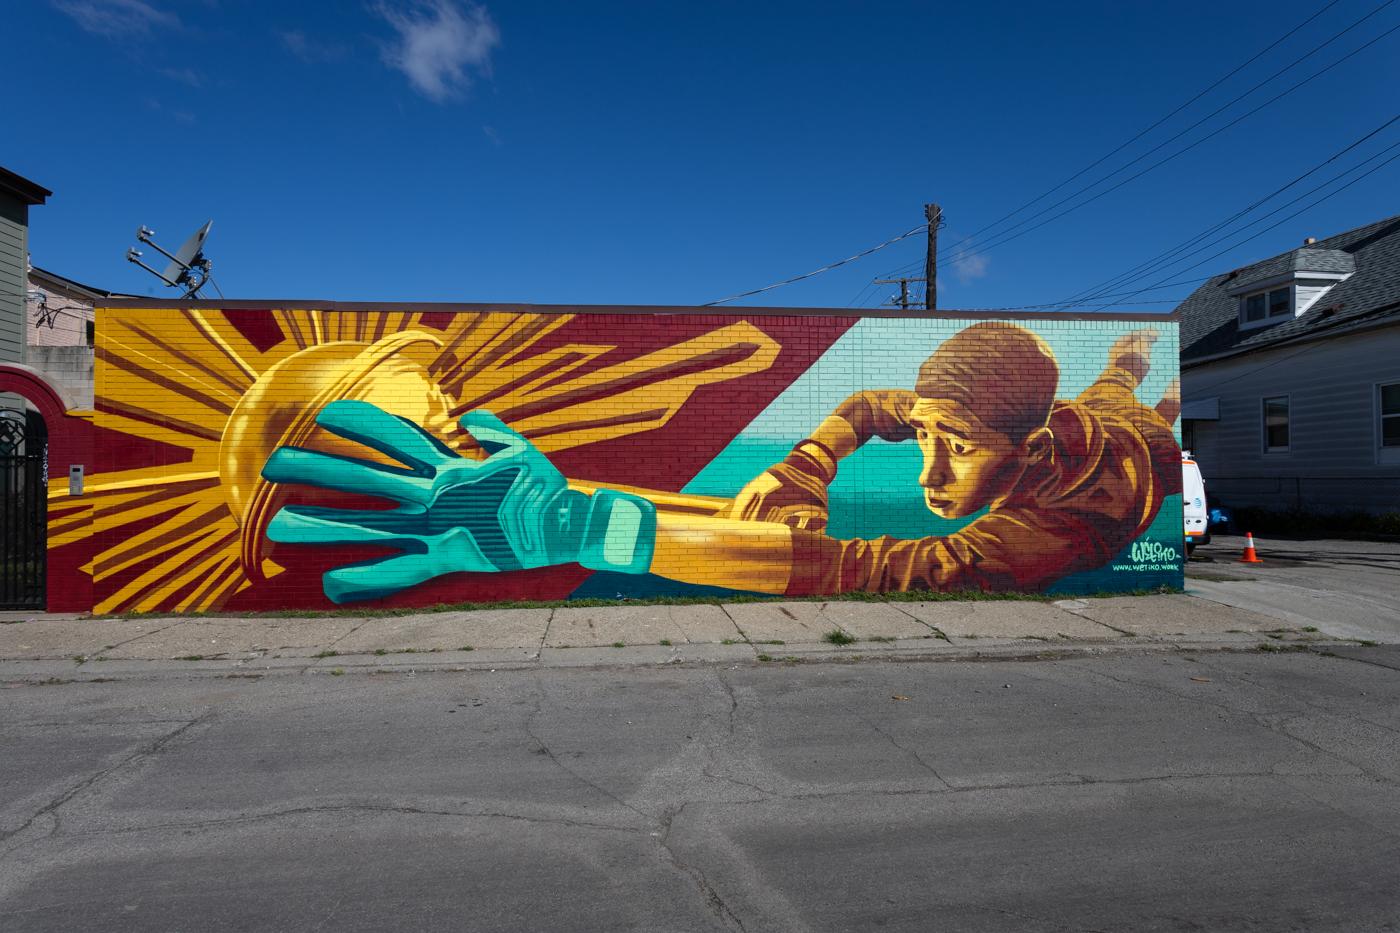 hamtramck+dcfc+mural+wetiko